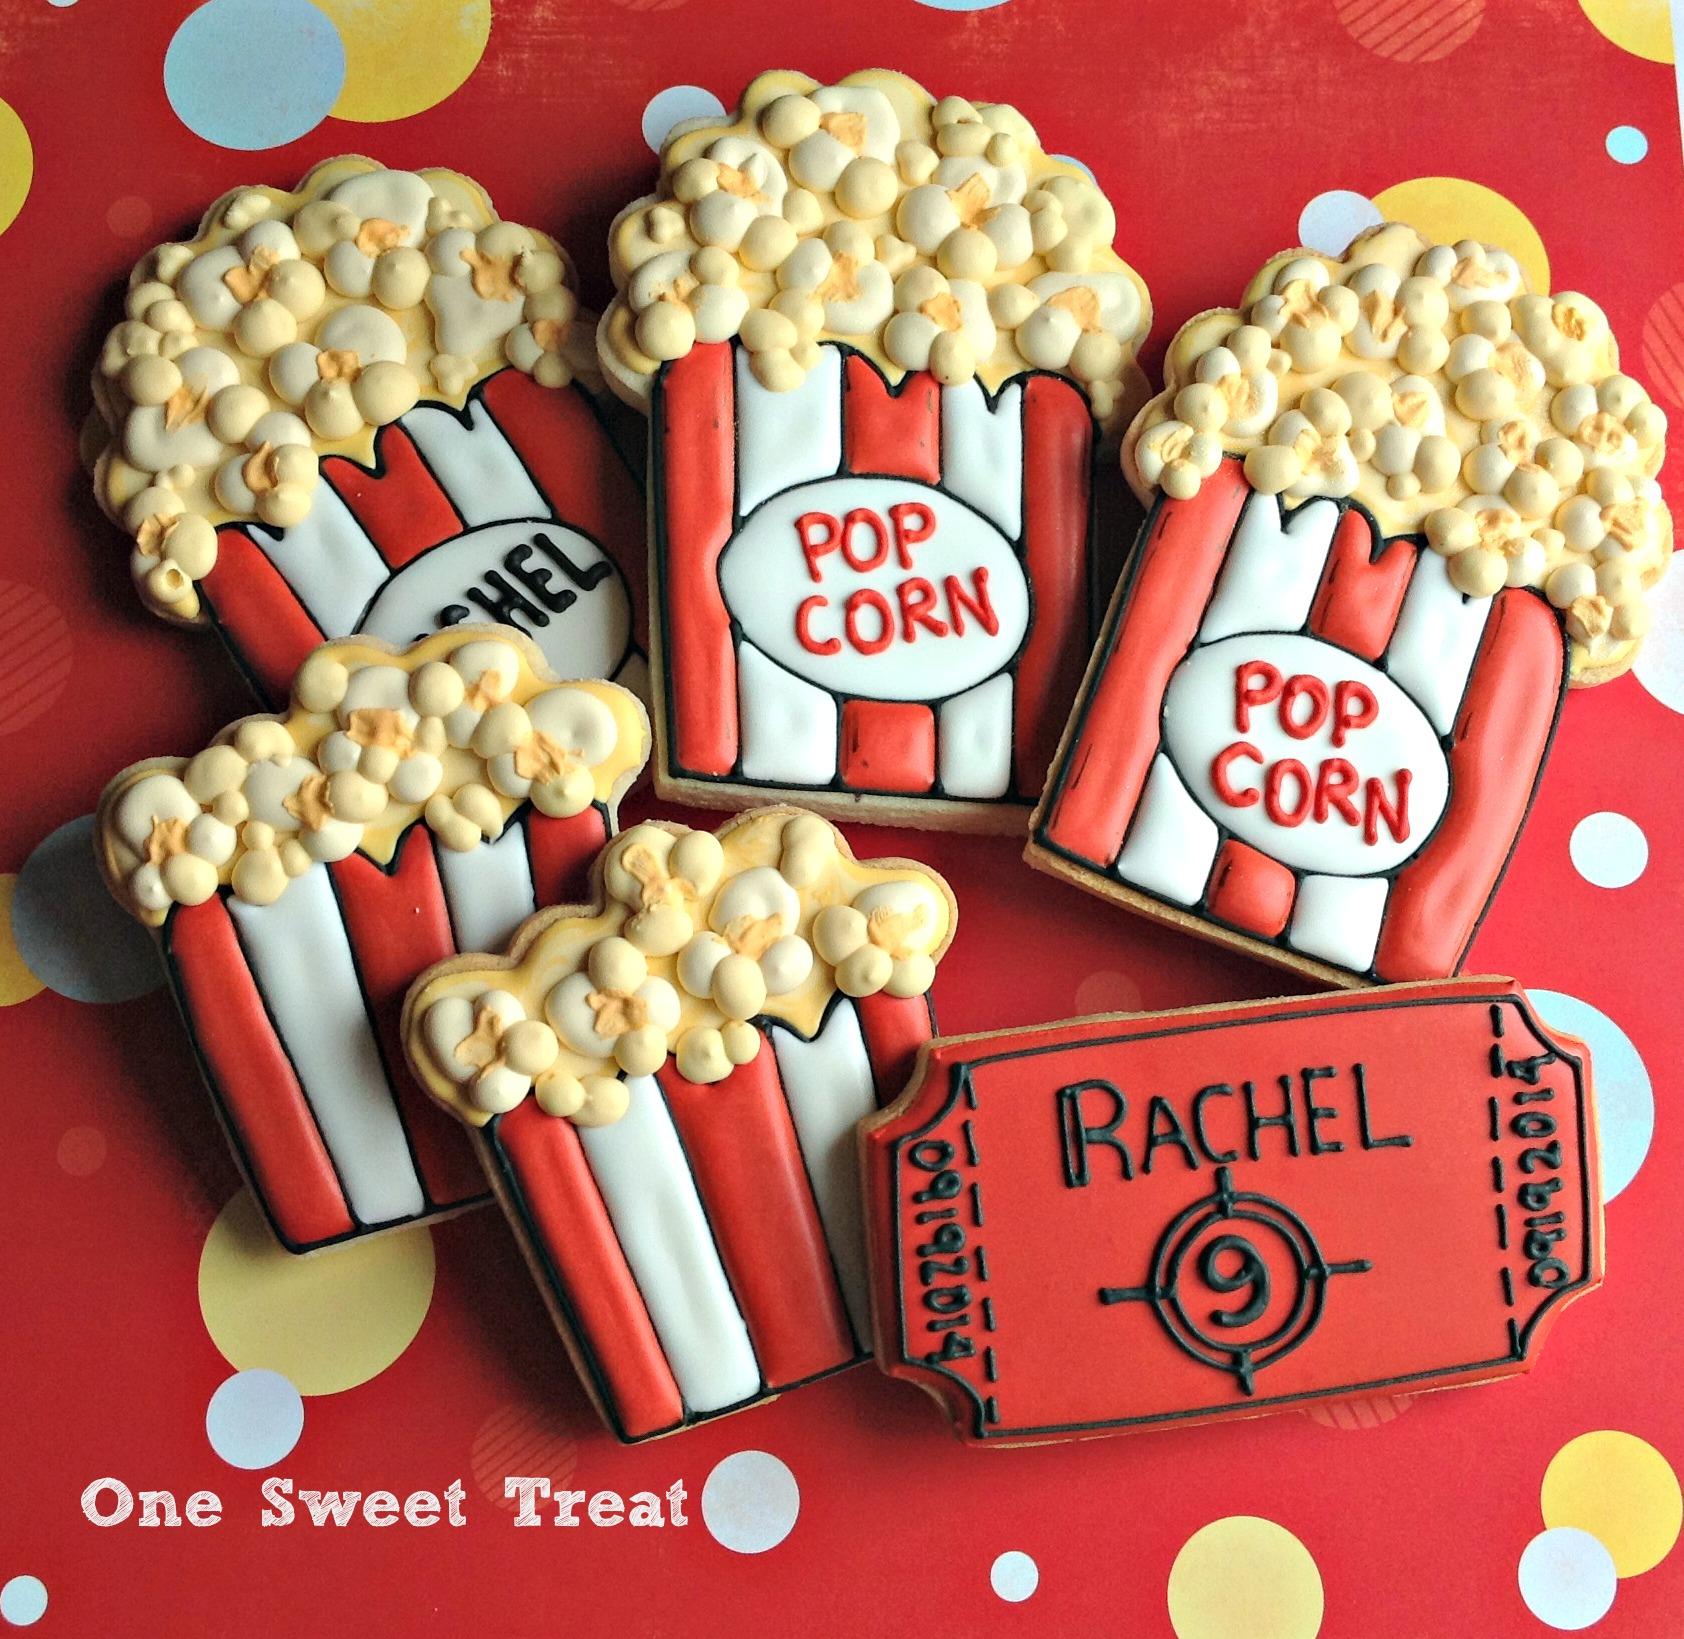 popcorn IMG_6726 1